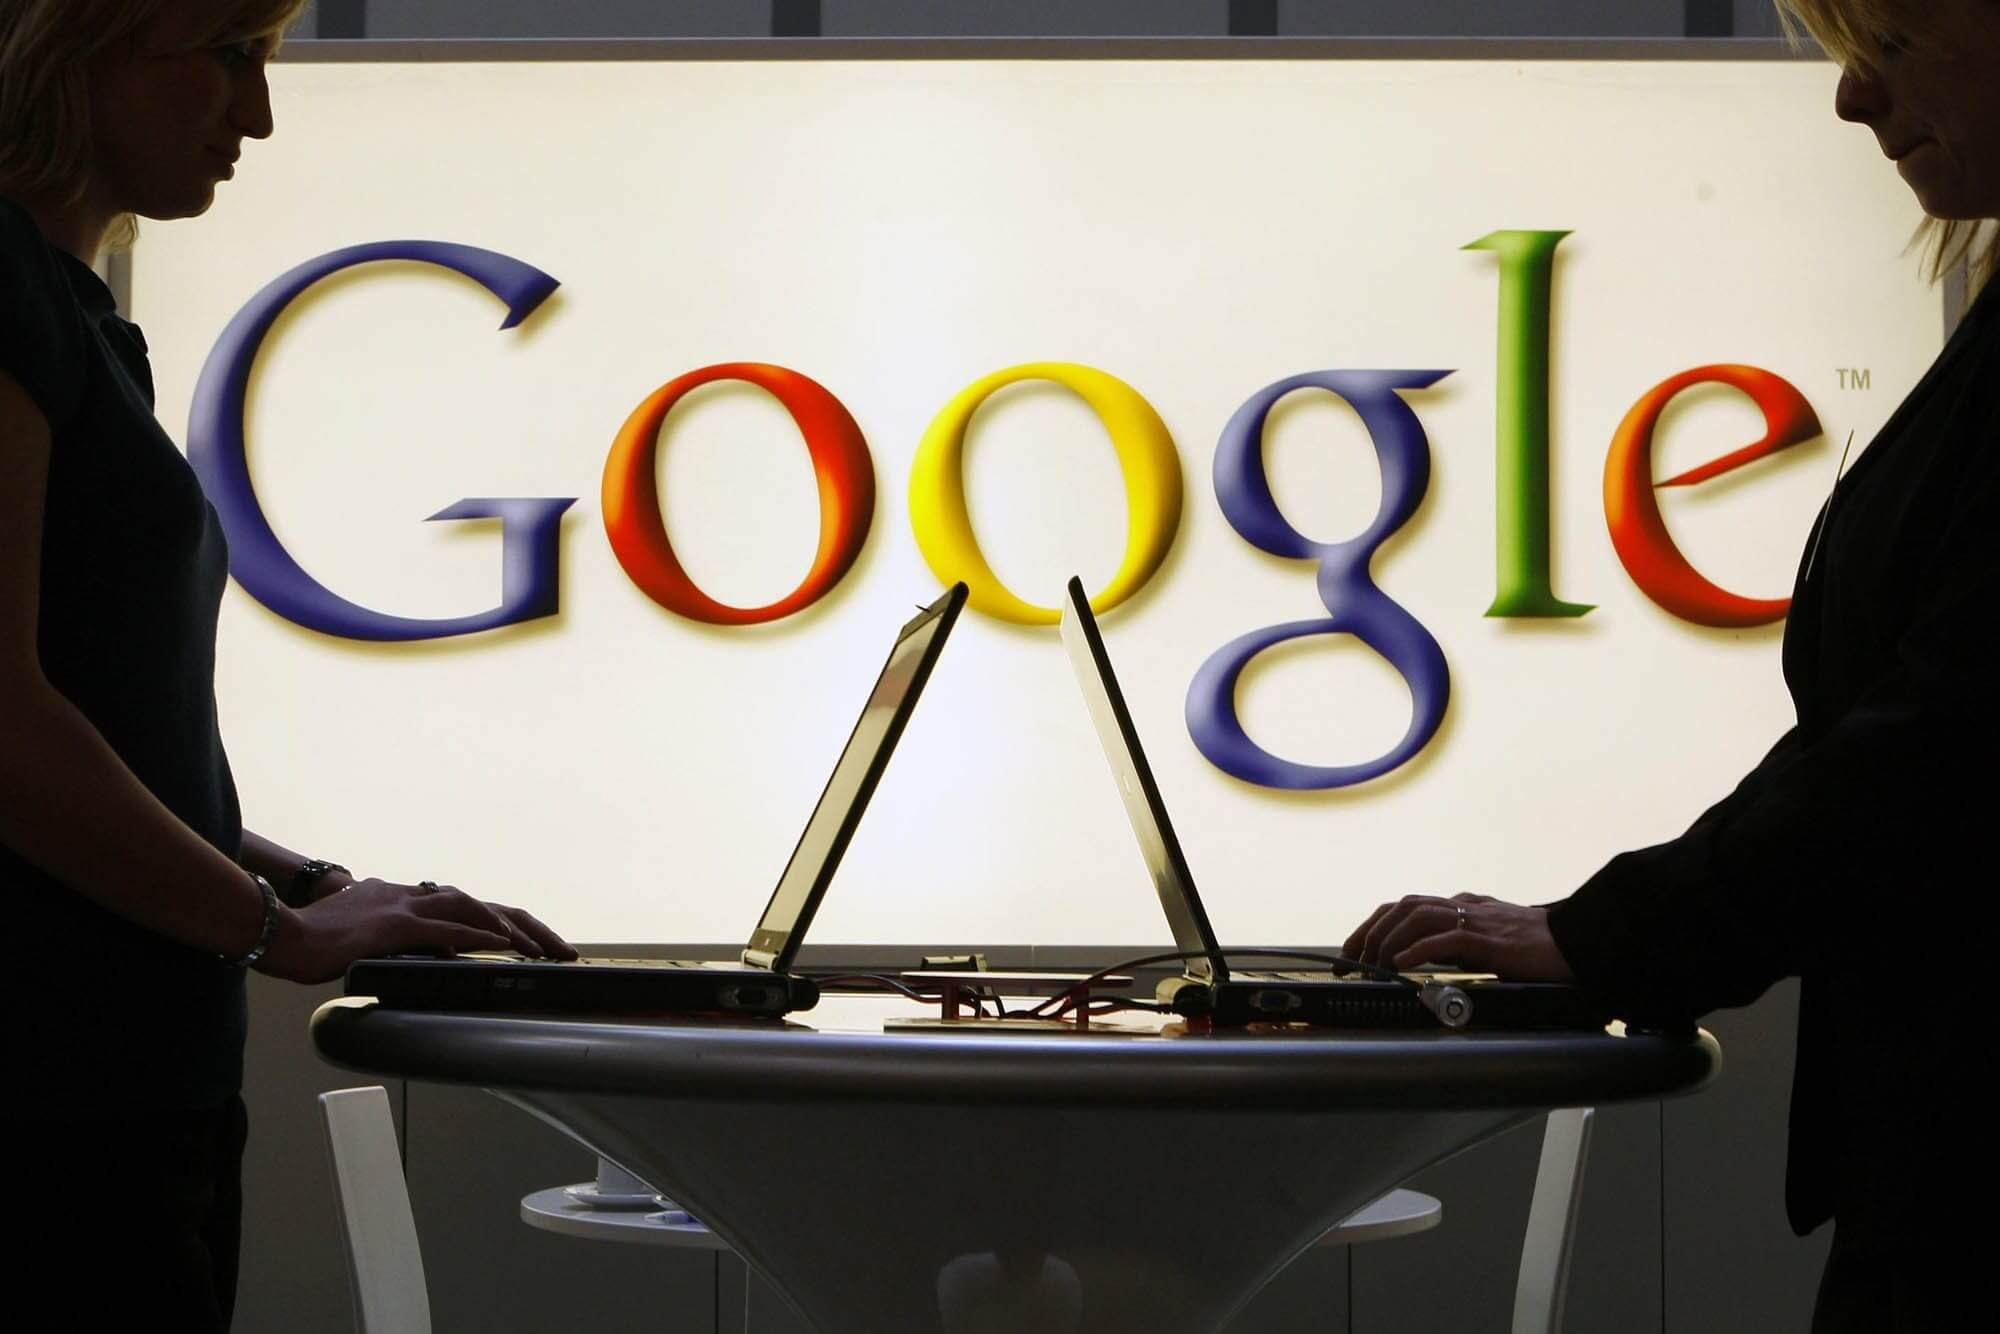 smt googletv capa - Google pode estar preparando sua entrada no mercado de vídeos on demand